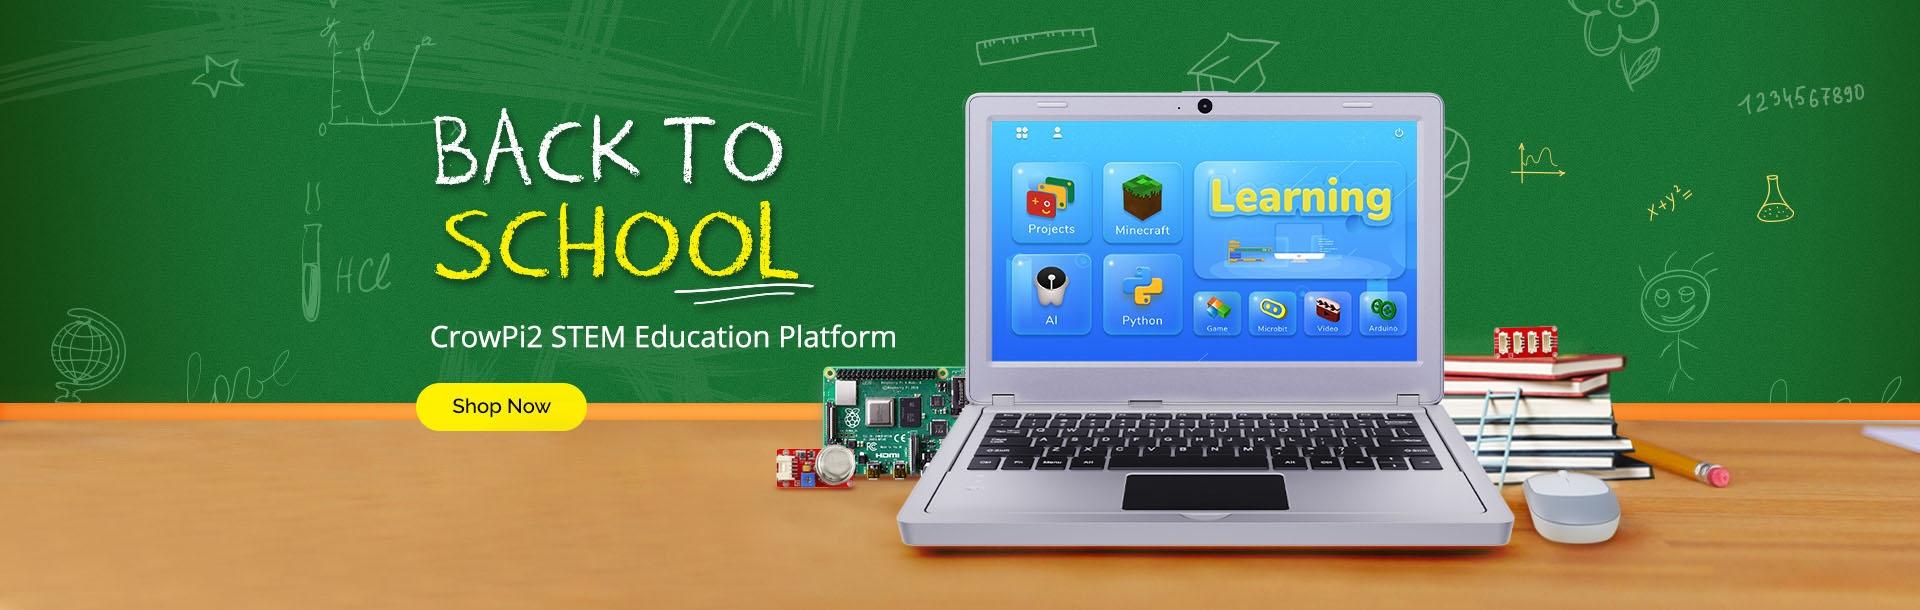 https://www.elecrow.com/crowpi2-raspberry-pi-portable-laptop.html